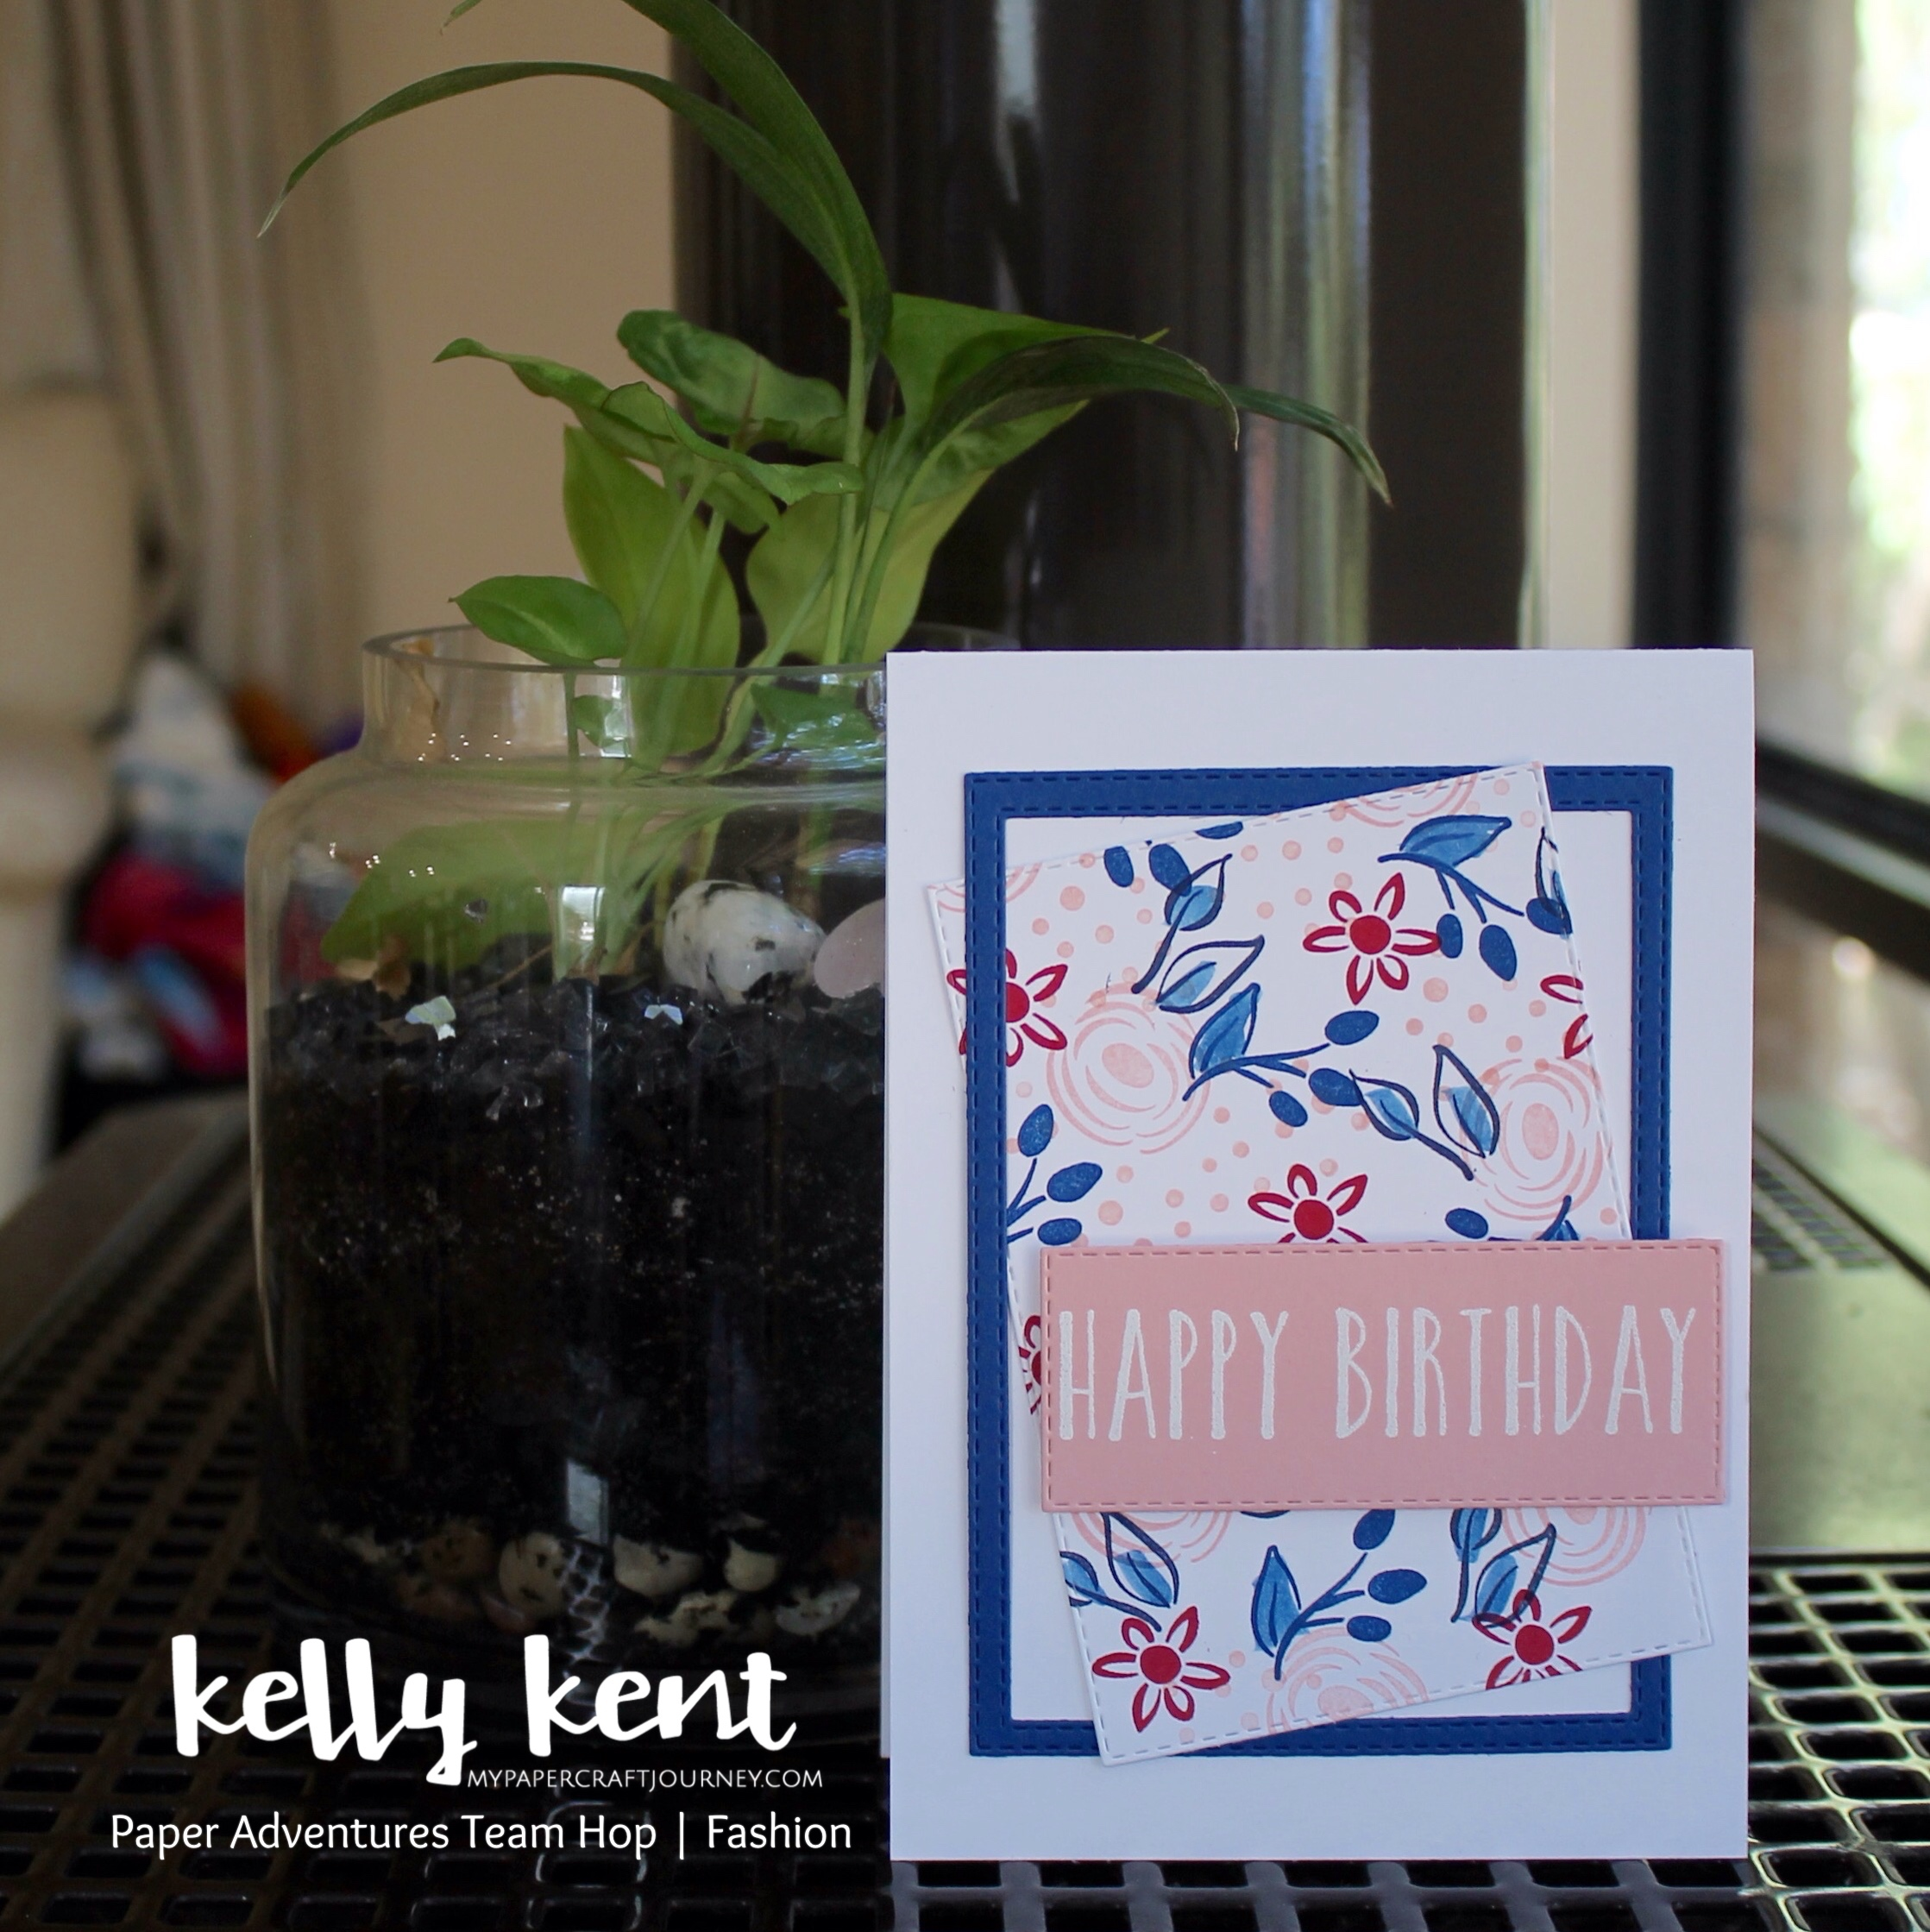 Perennial Birthday | kelly kent